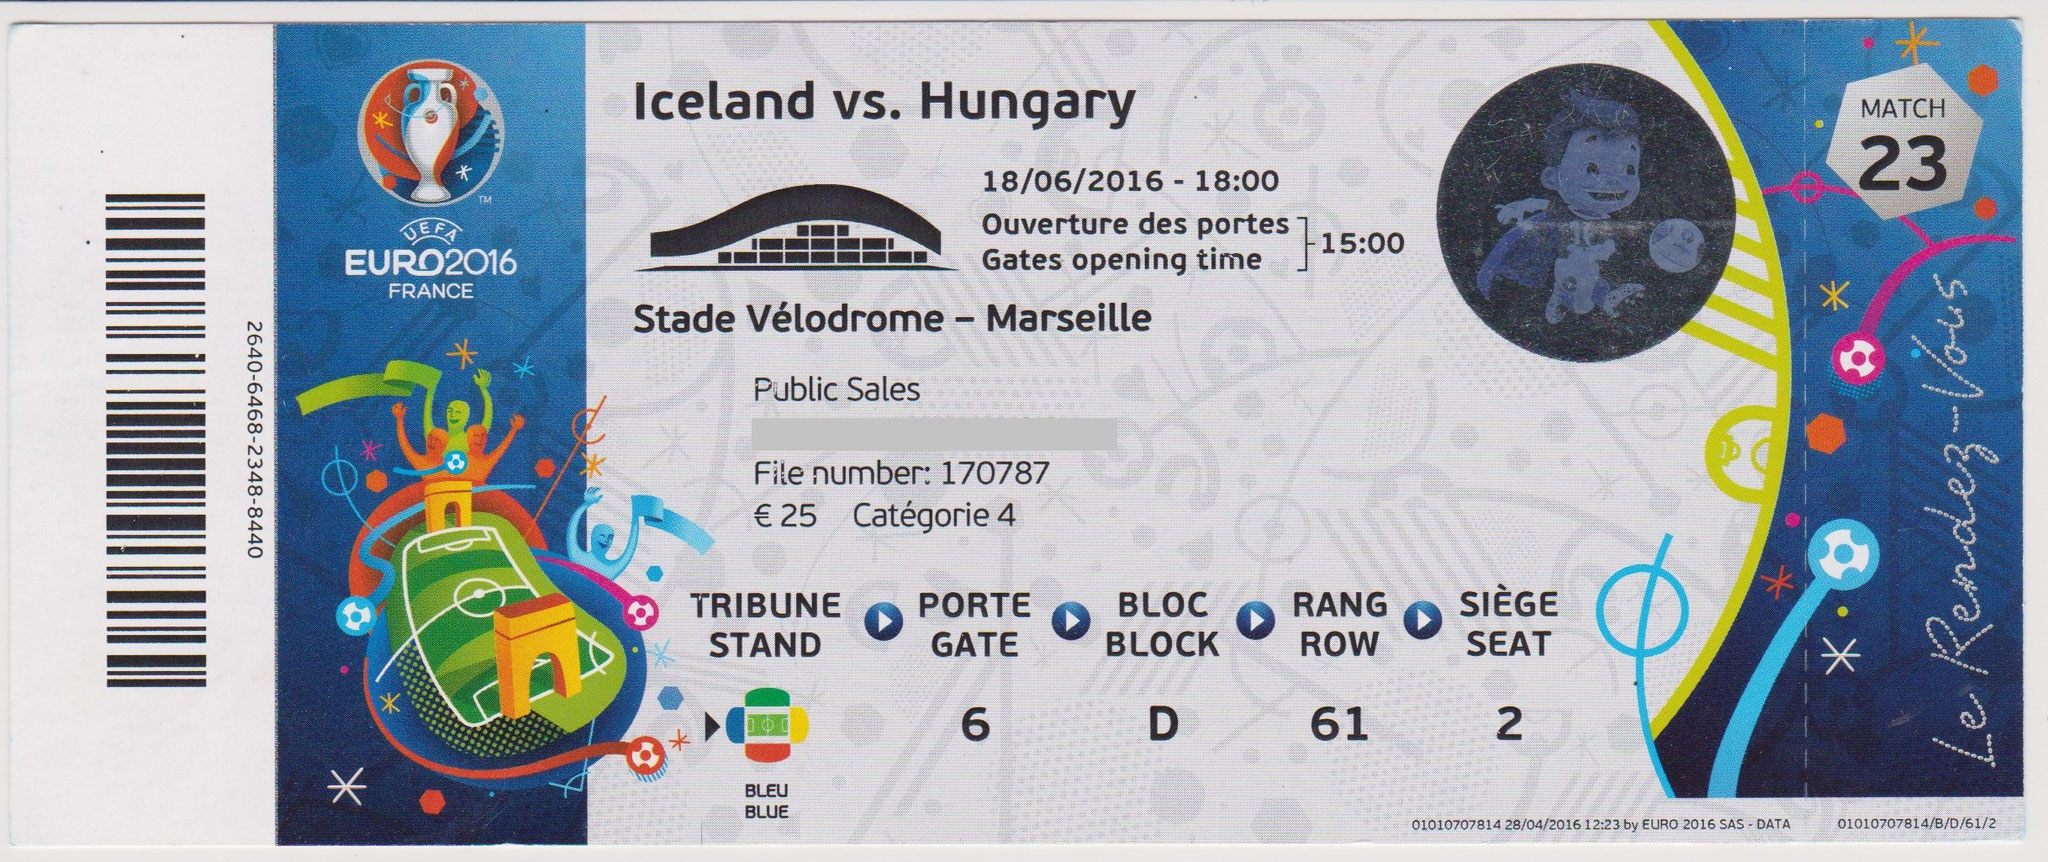 18/06/2016 Marseille :  Islande 1 - 1  Hongrie  > G. Sigurdsson (pen) (Isl) -- B. Saeversson (csc) (Hon)